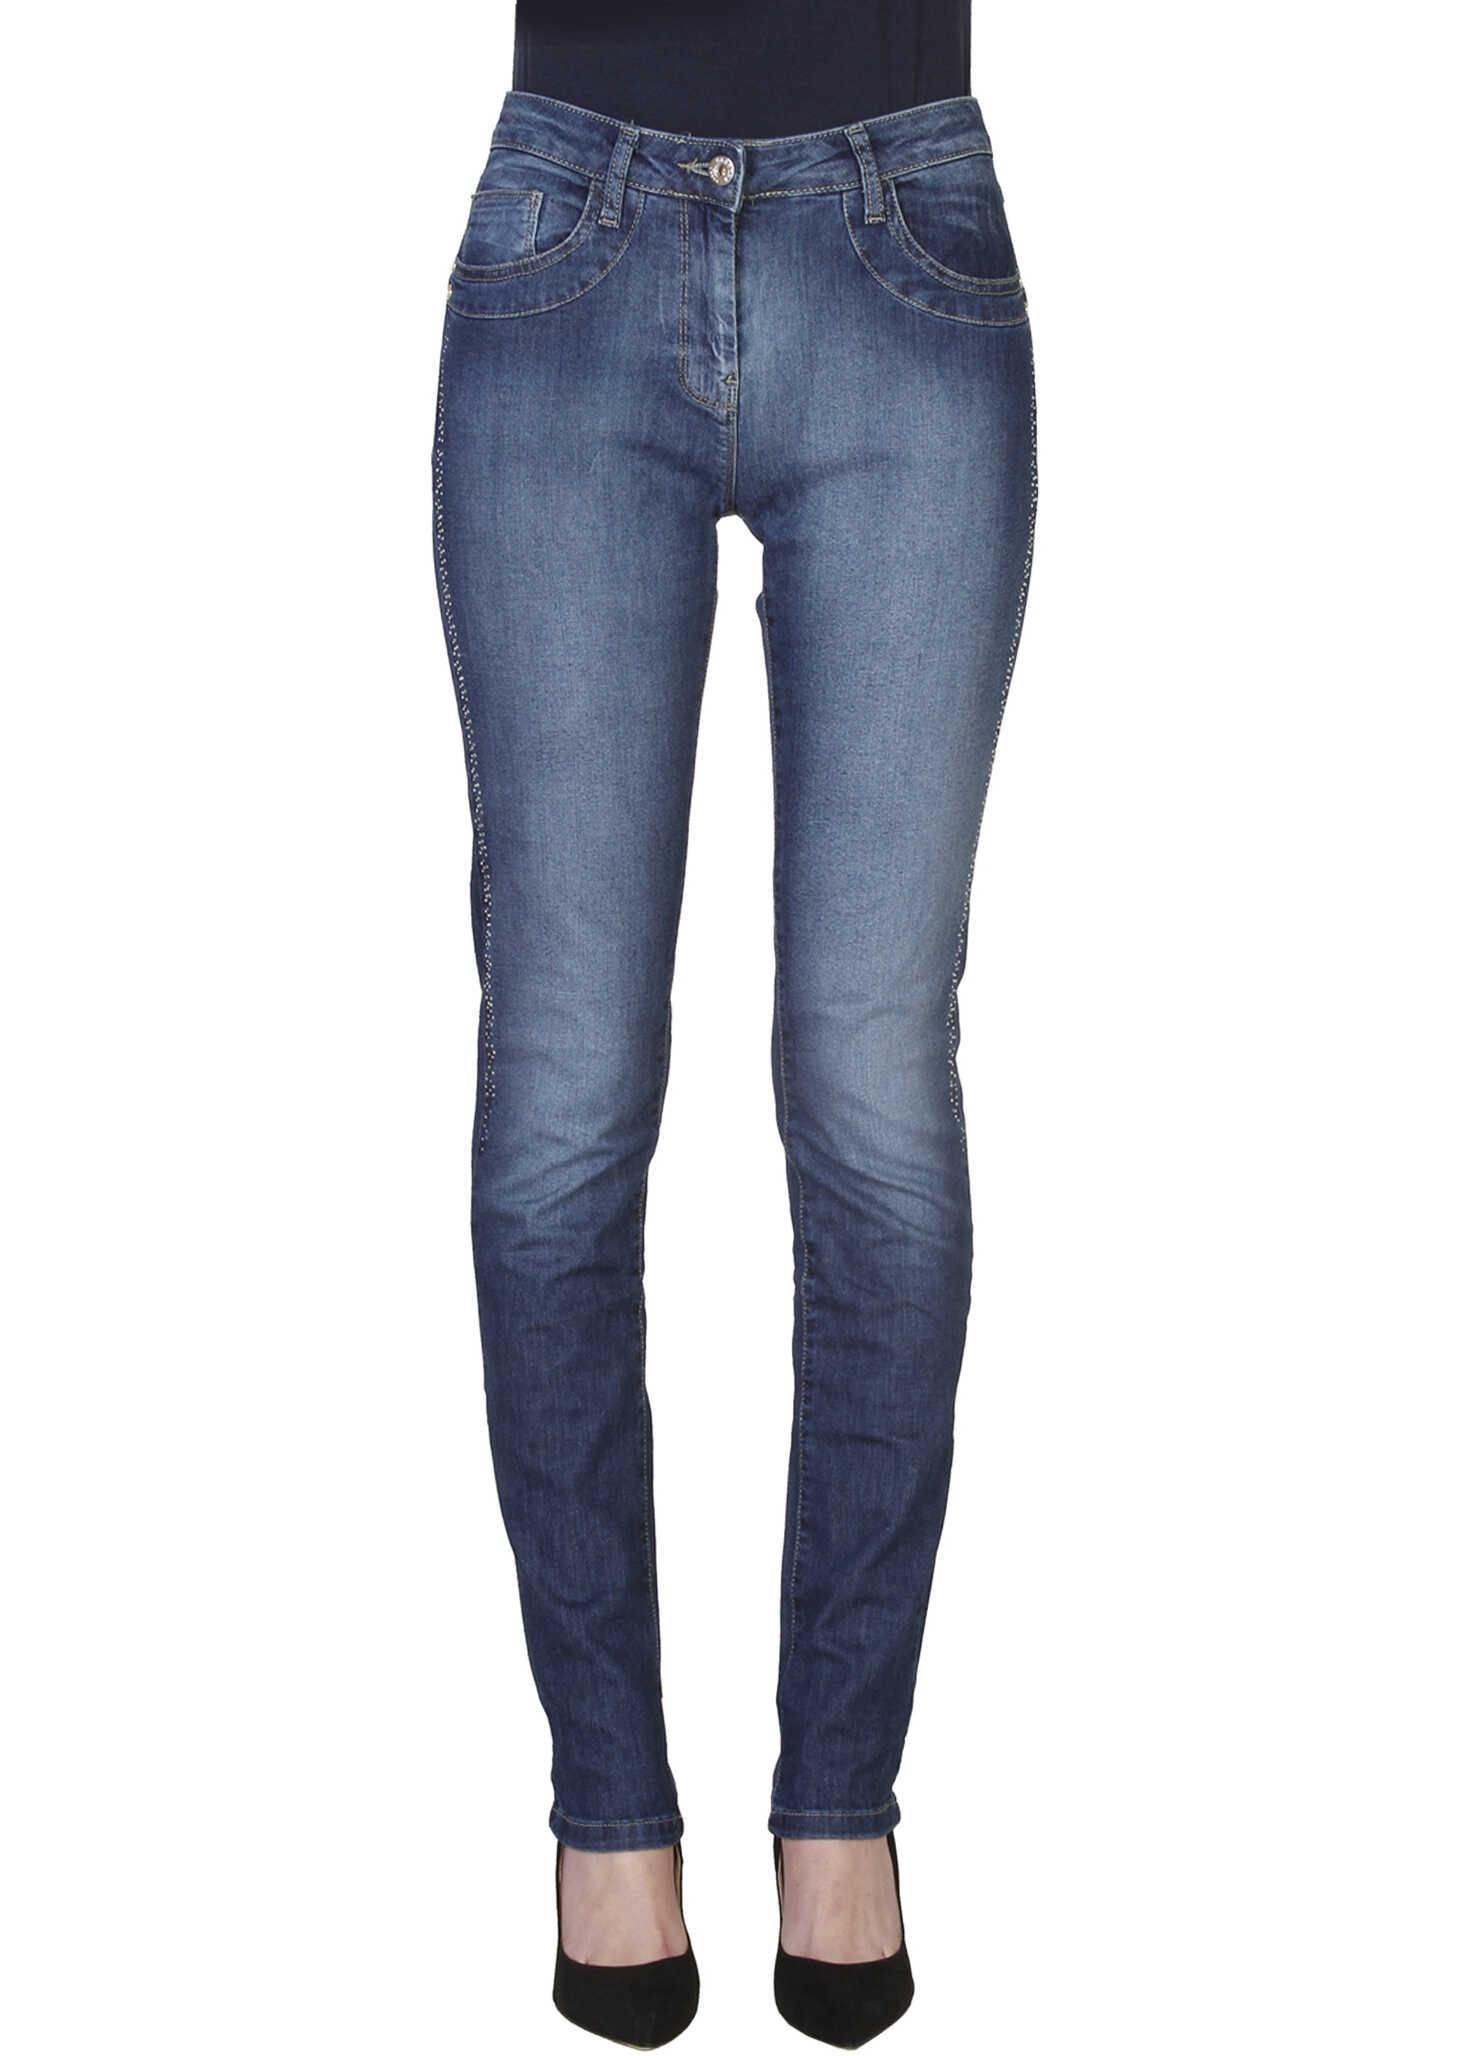 Carrera Jeans 0t752s_0987a* Blue